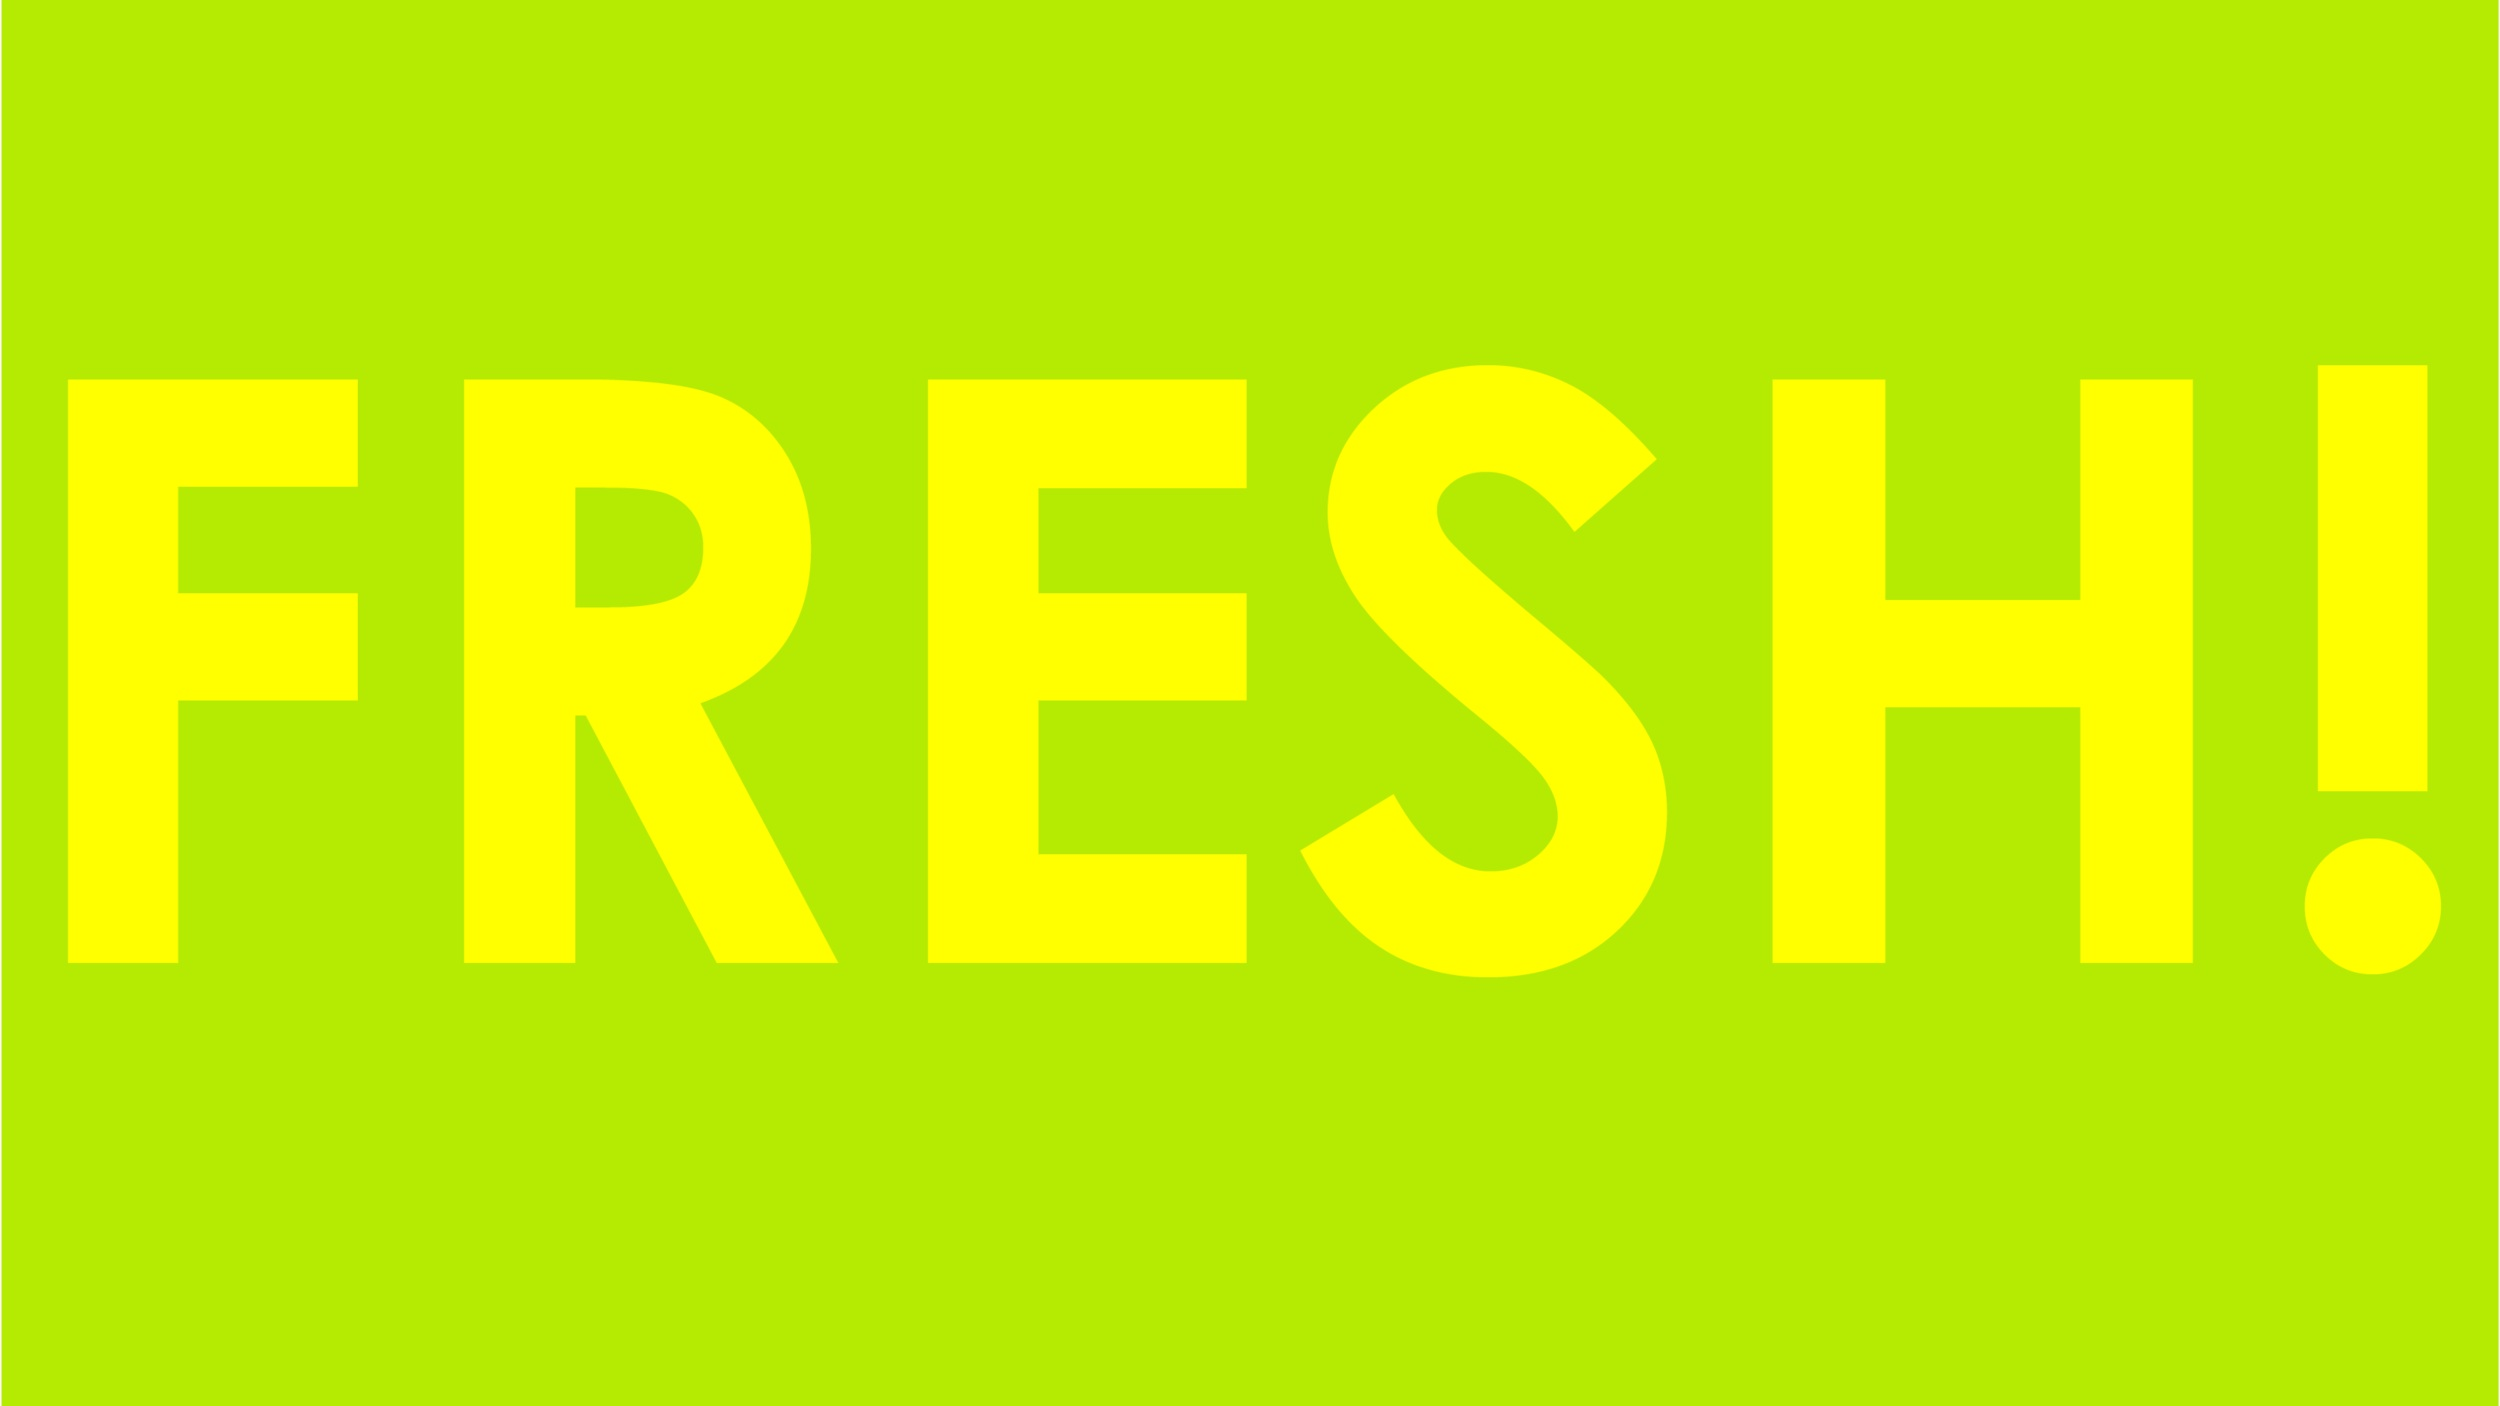 fresh%21+lime+box.jpg